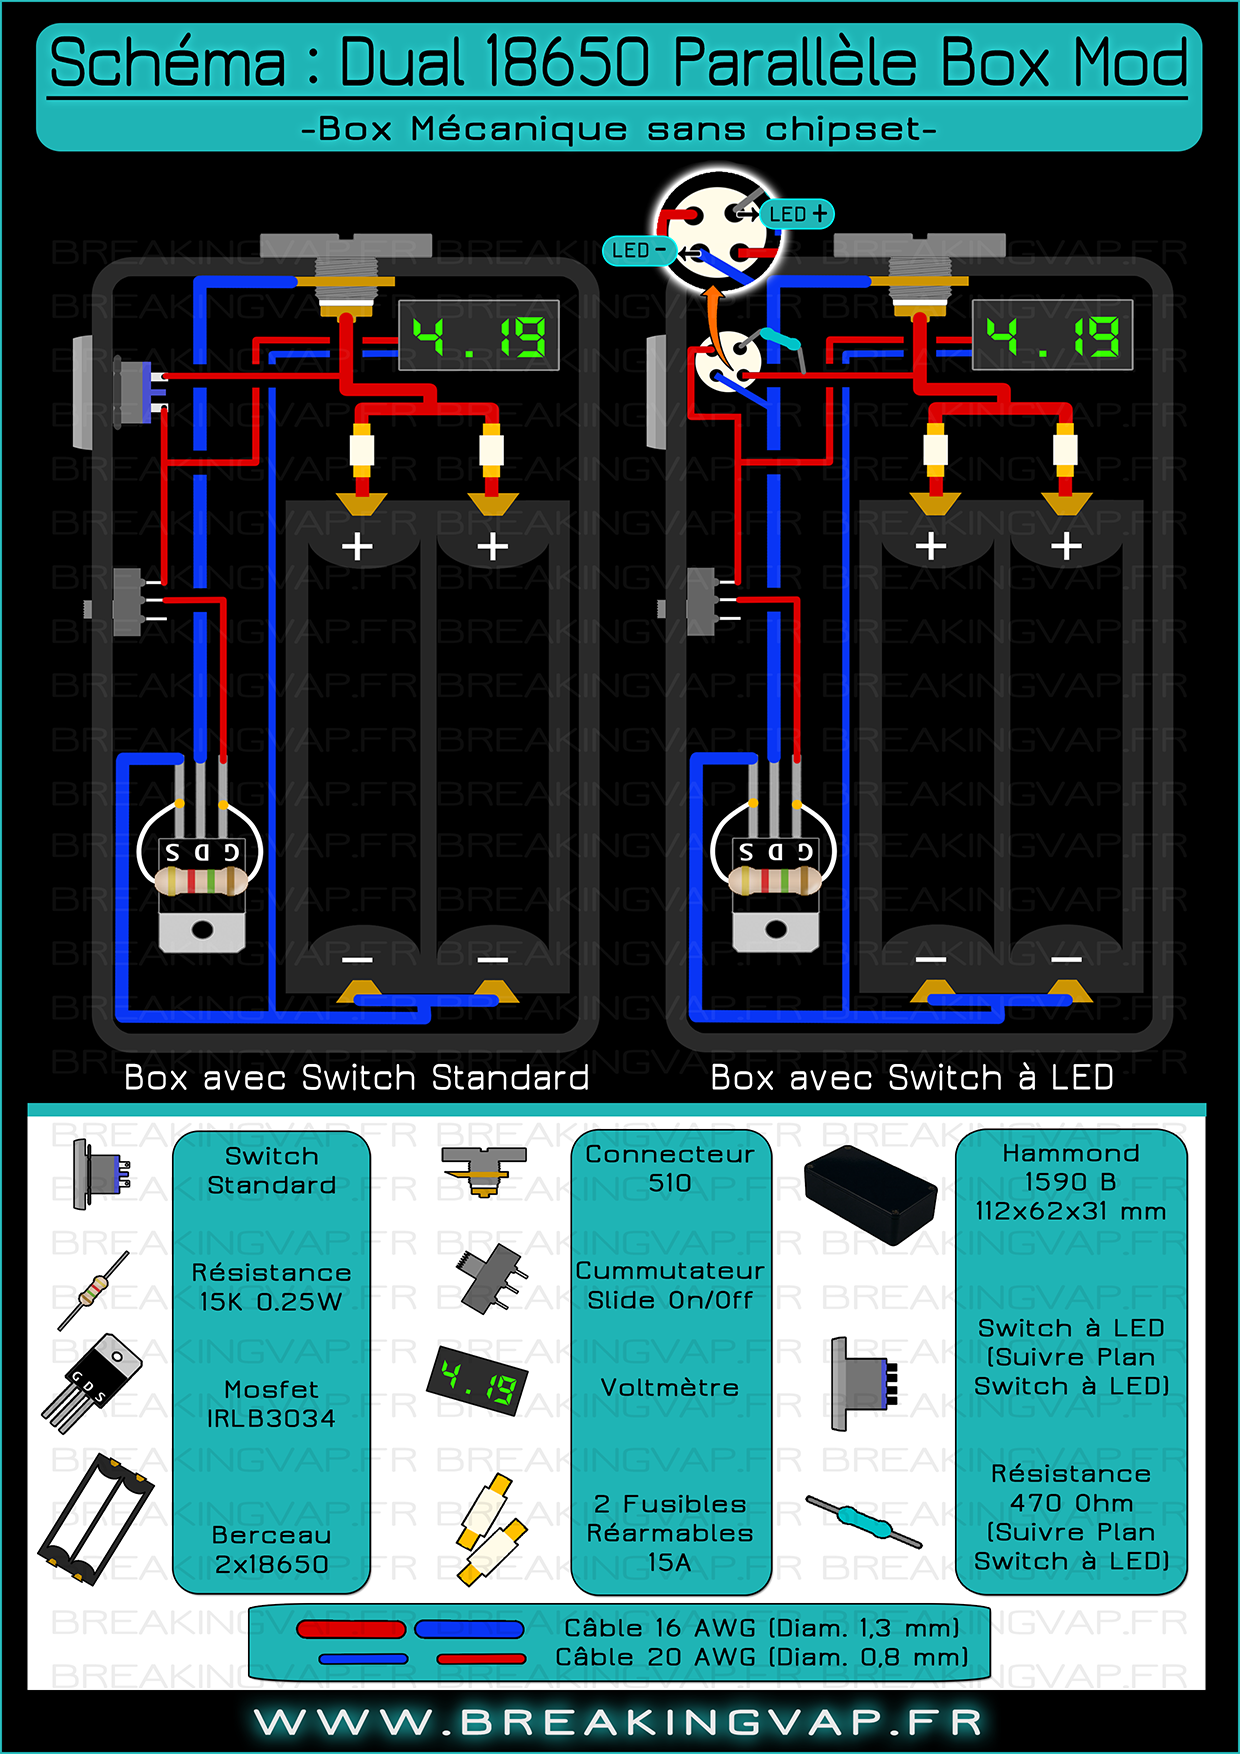 hight resolution of sch ma box mod dual 18650 parallele